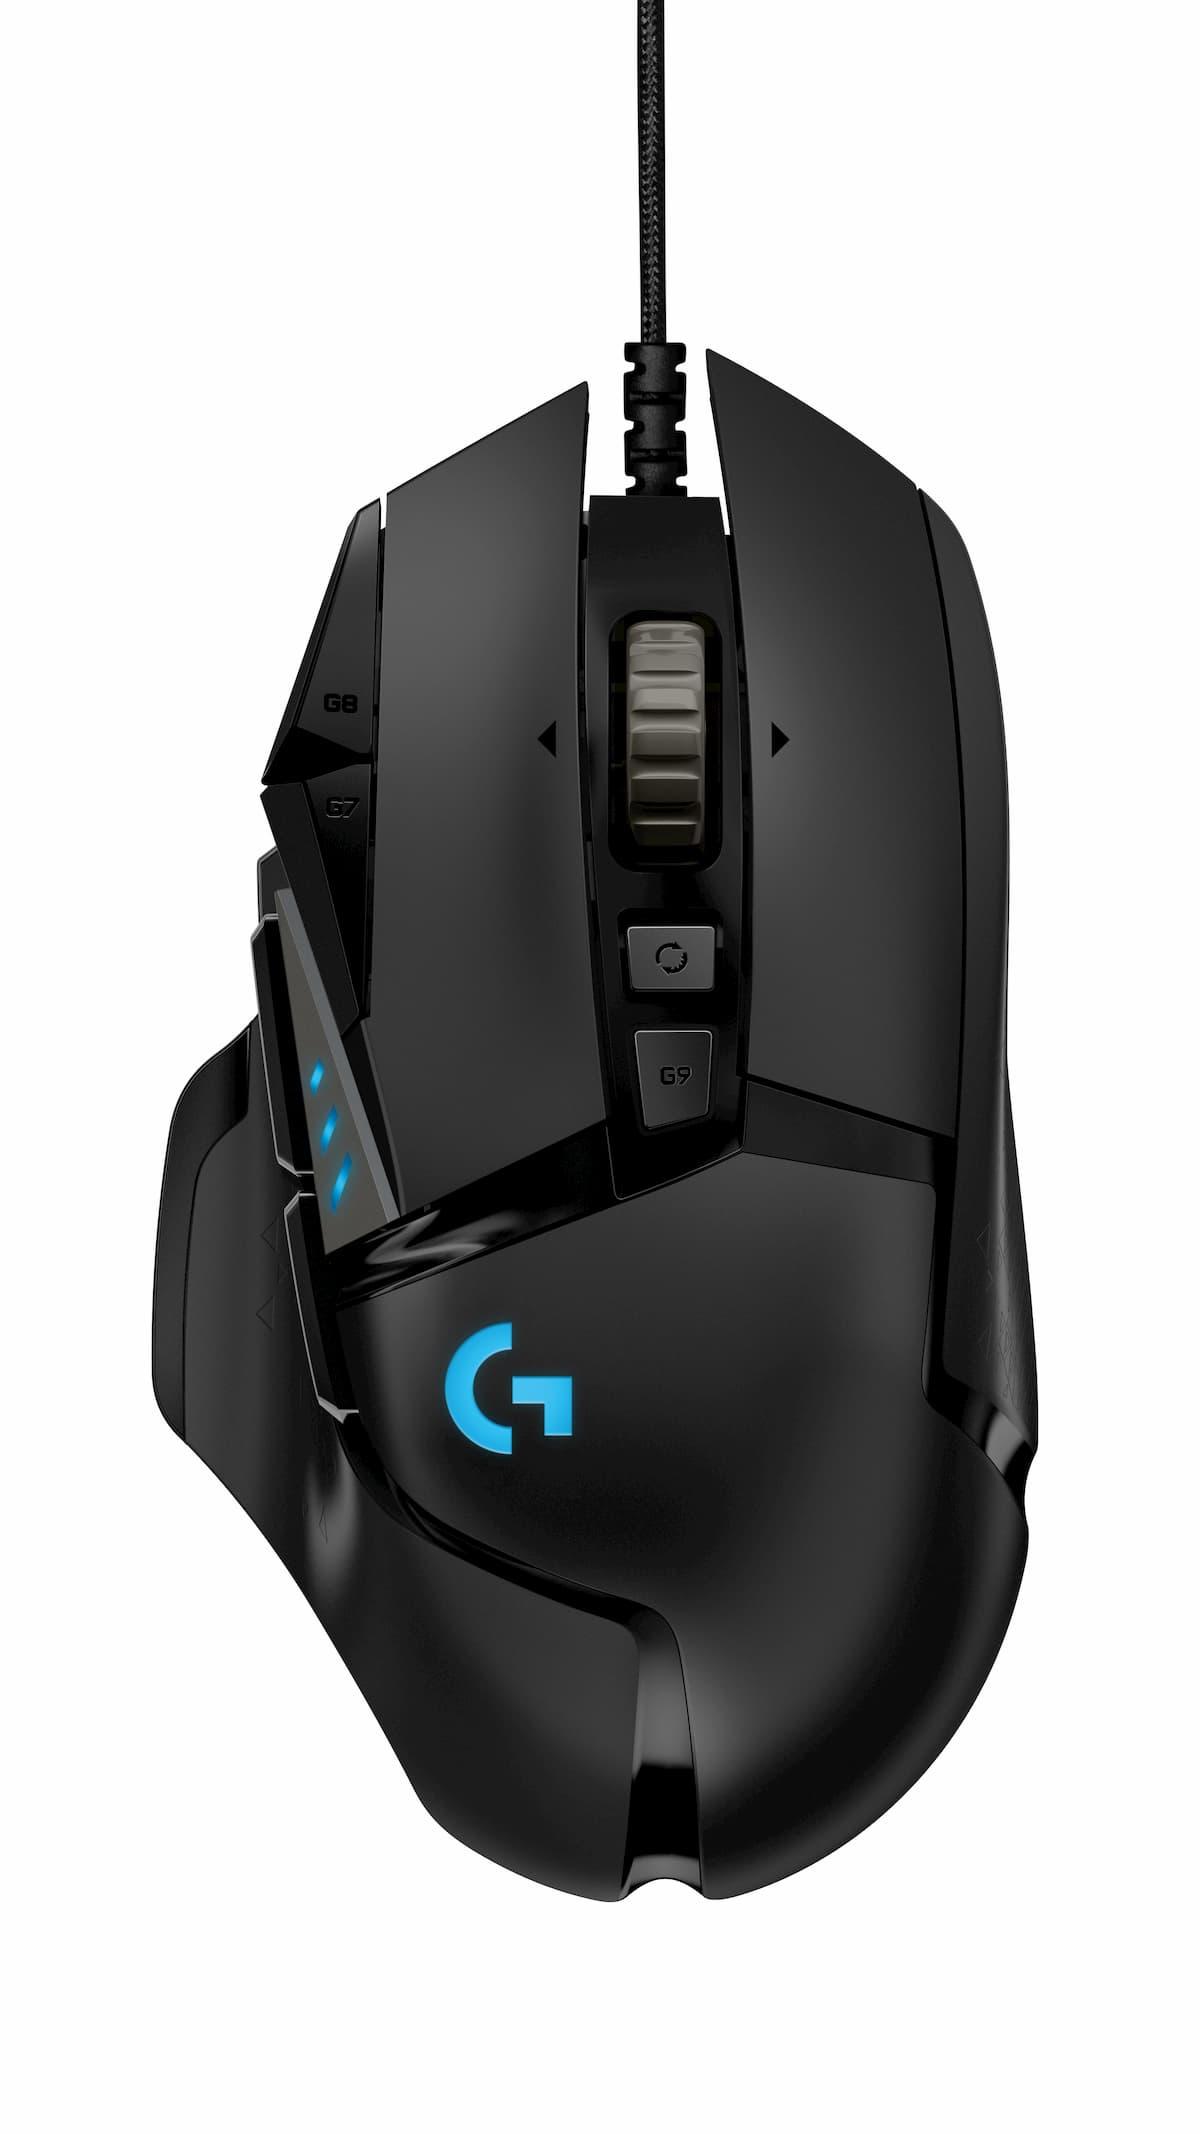 G502 HERO ゲーミングマウス G502RGBhr